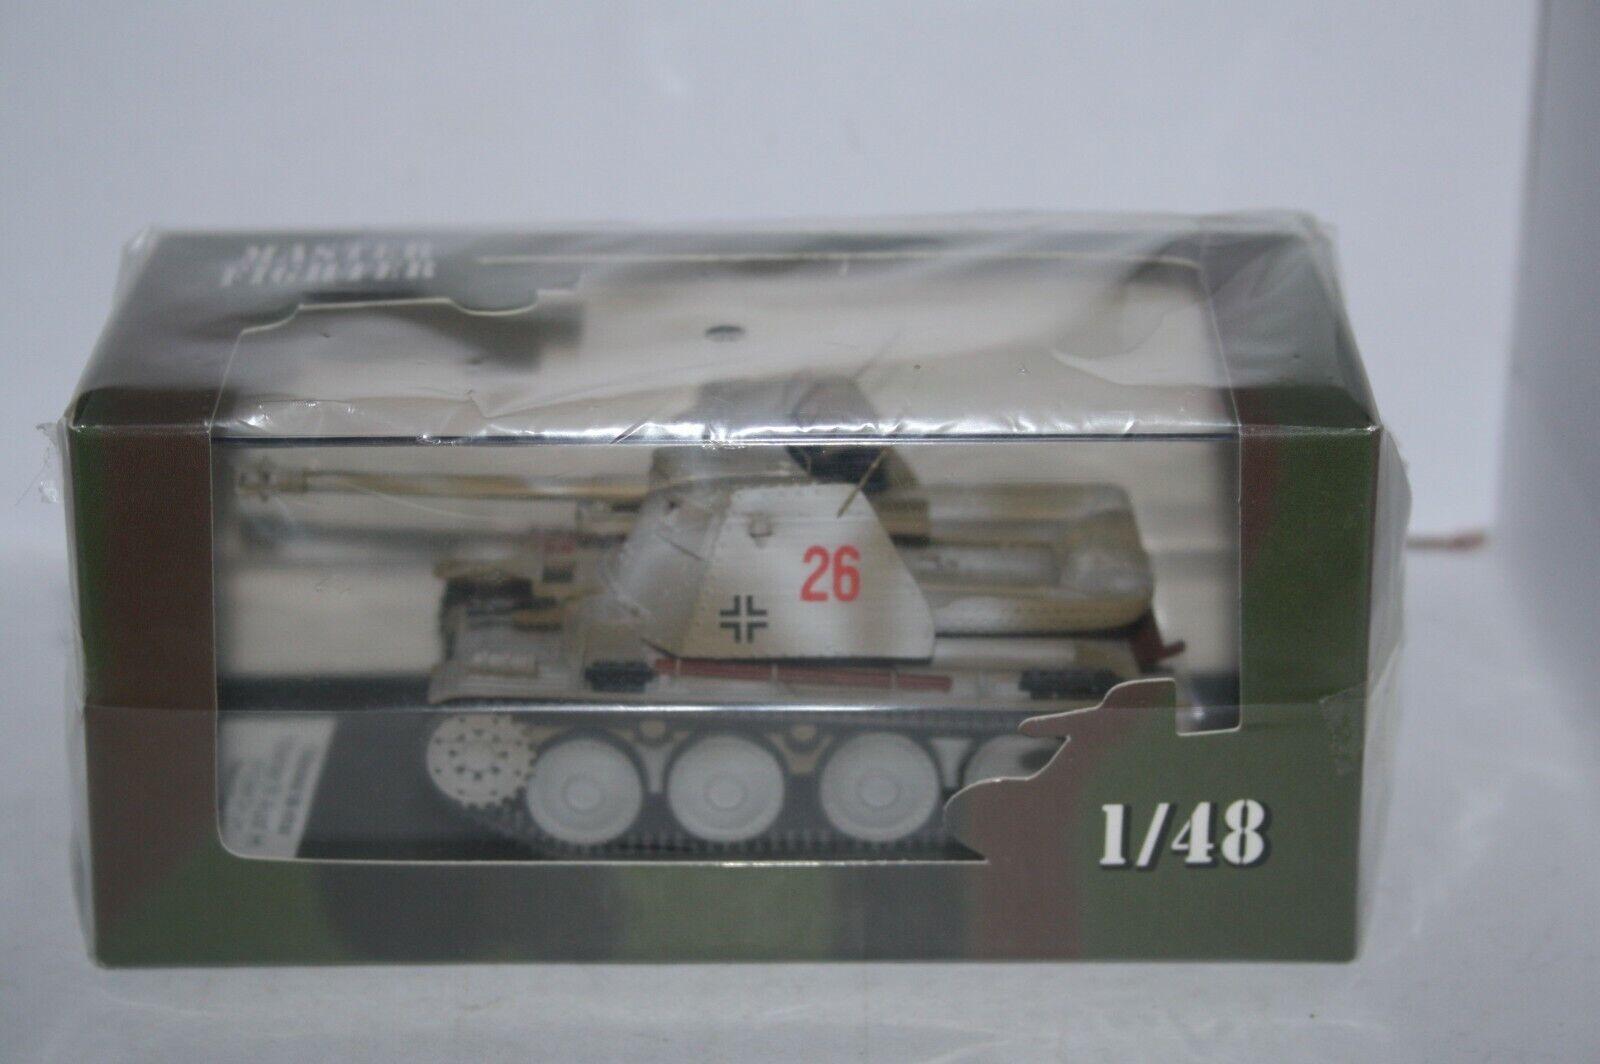 Master combatiente 148 chasseur de char  marder III  ausf.h kharkov russie 1943